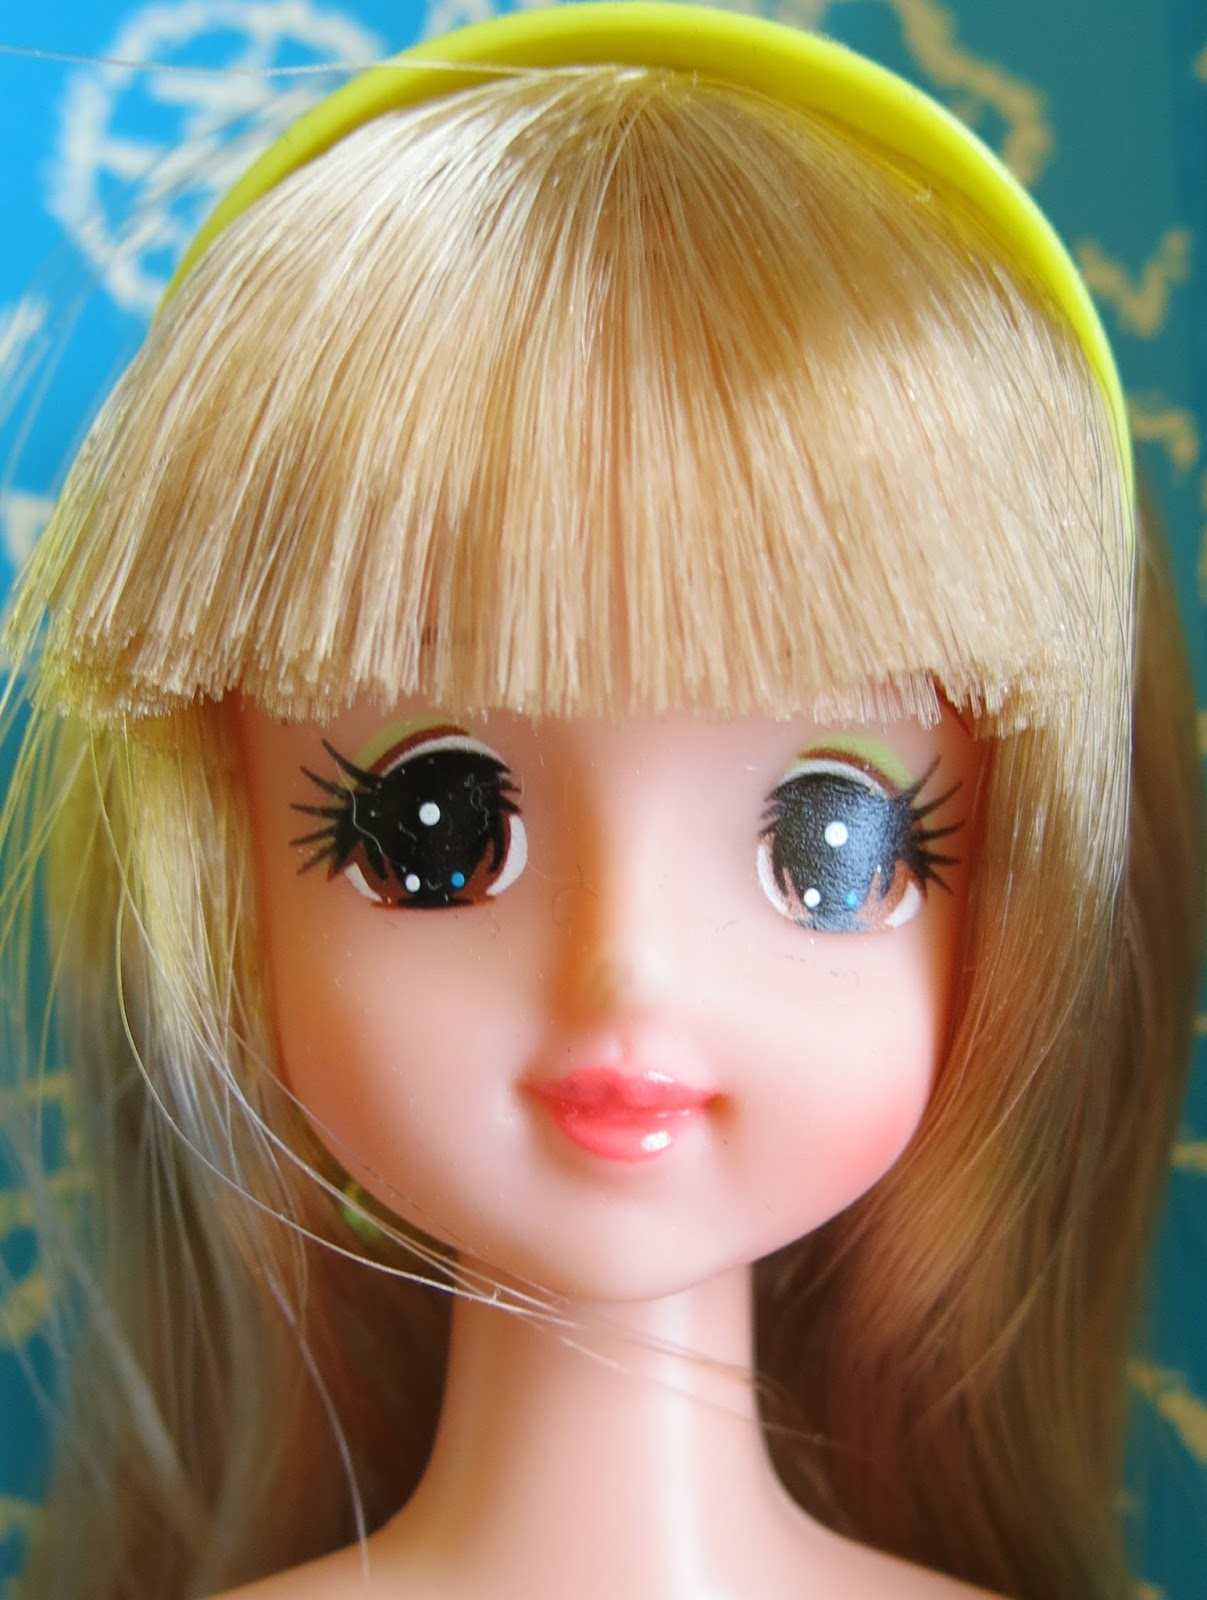 Barbie Mattel Western And Barbie Kissing Cheapest Price From Our Site Bambole E Accessori Bambole